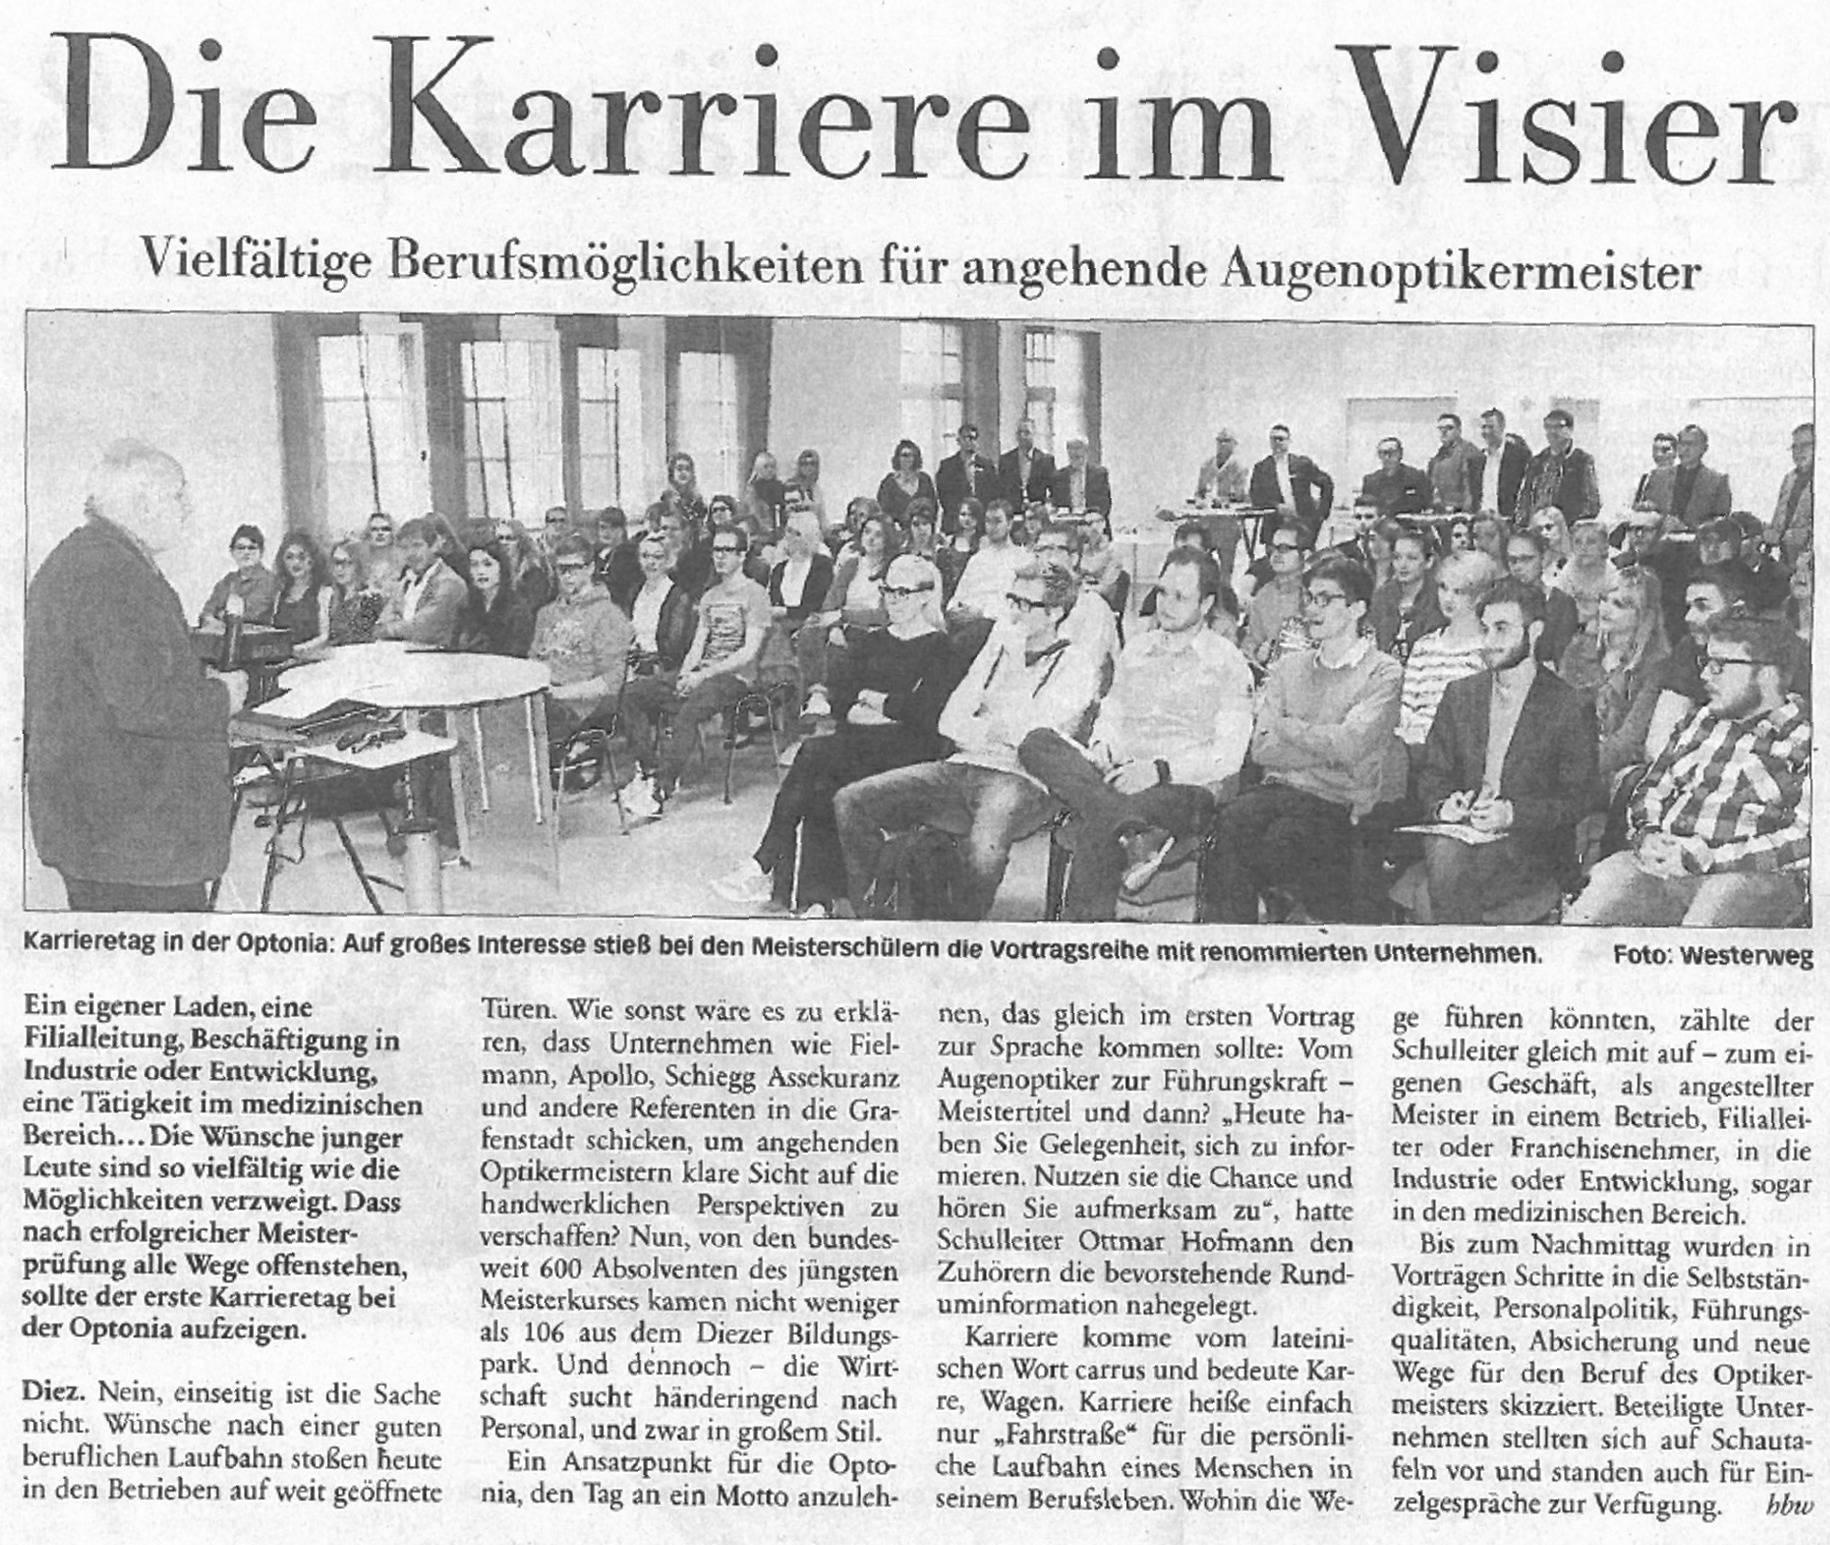 Pressemitteilung: Karrieretag an der Optonia (April 2016)